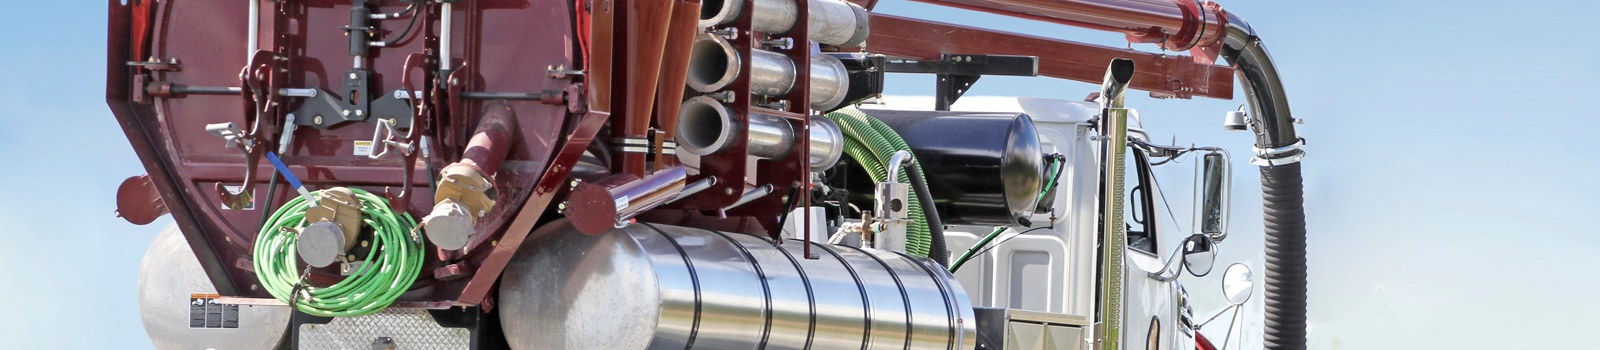 Liquid Waste Equipment Financing